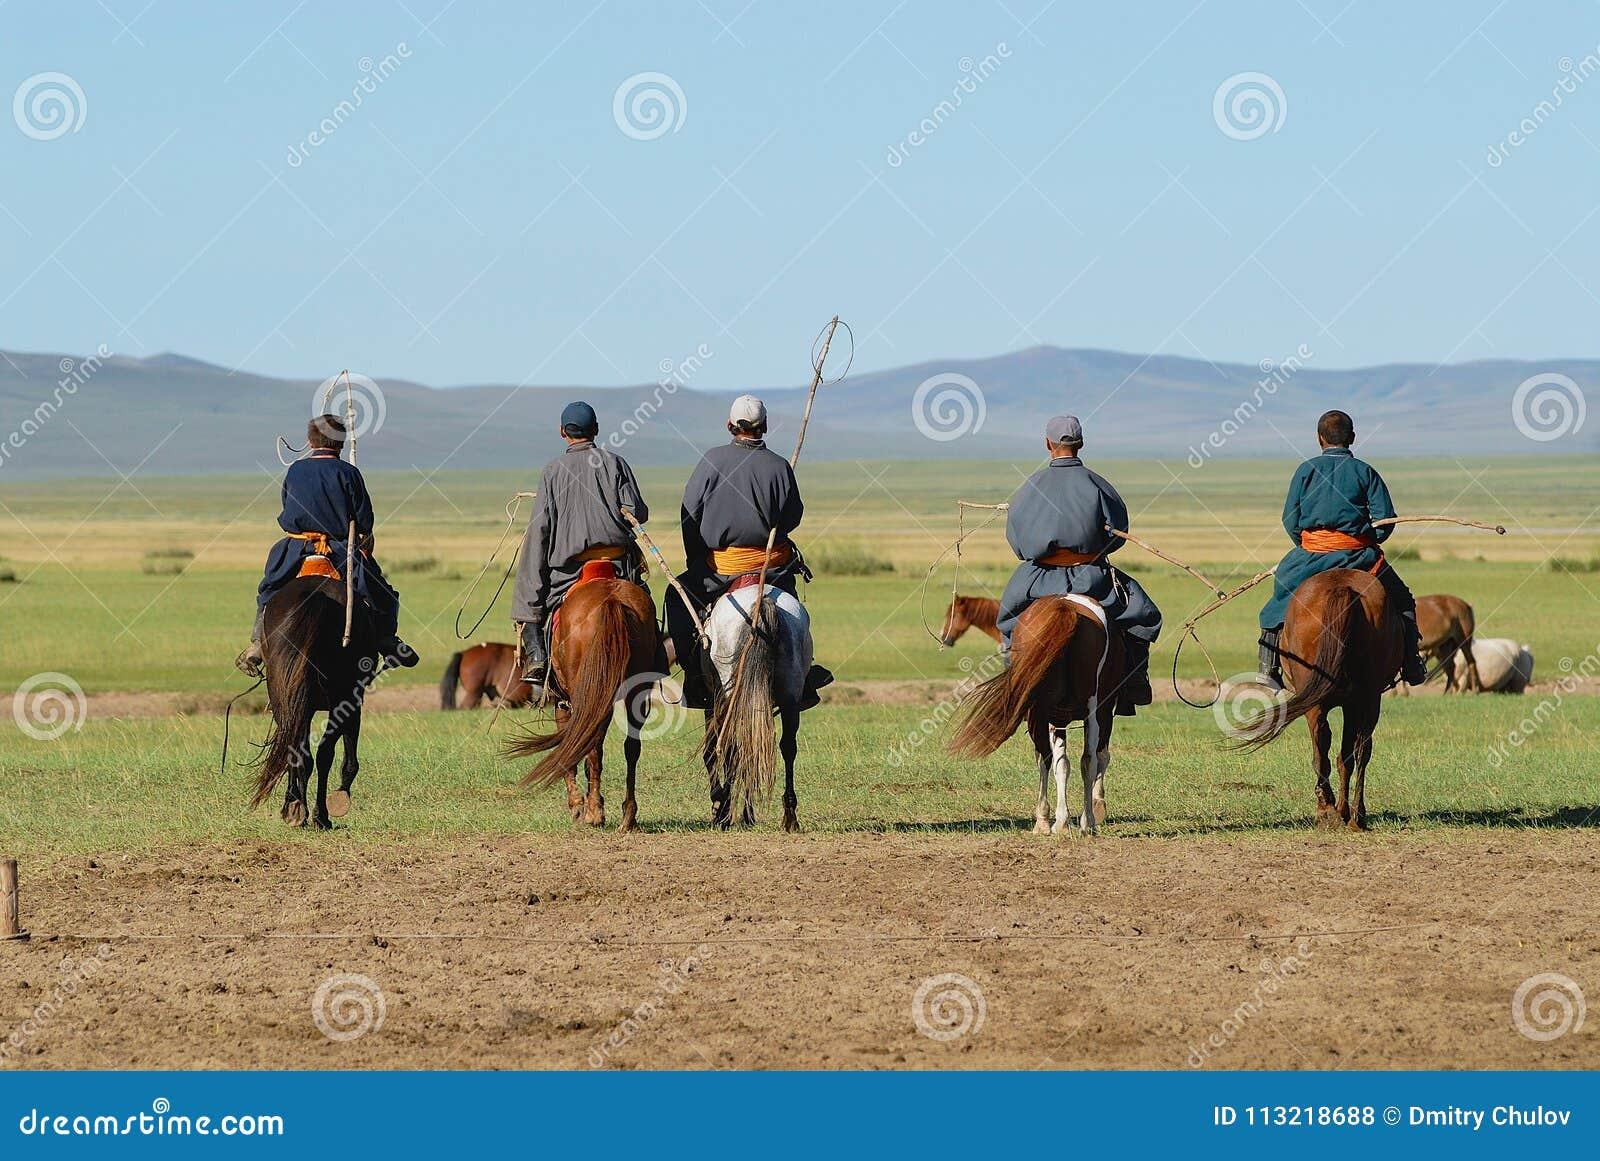 männer reiten